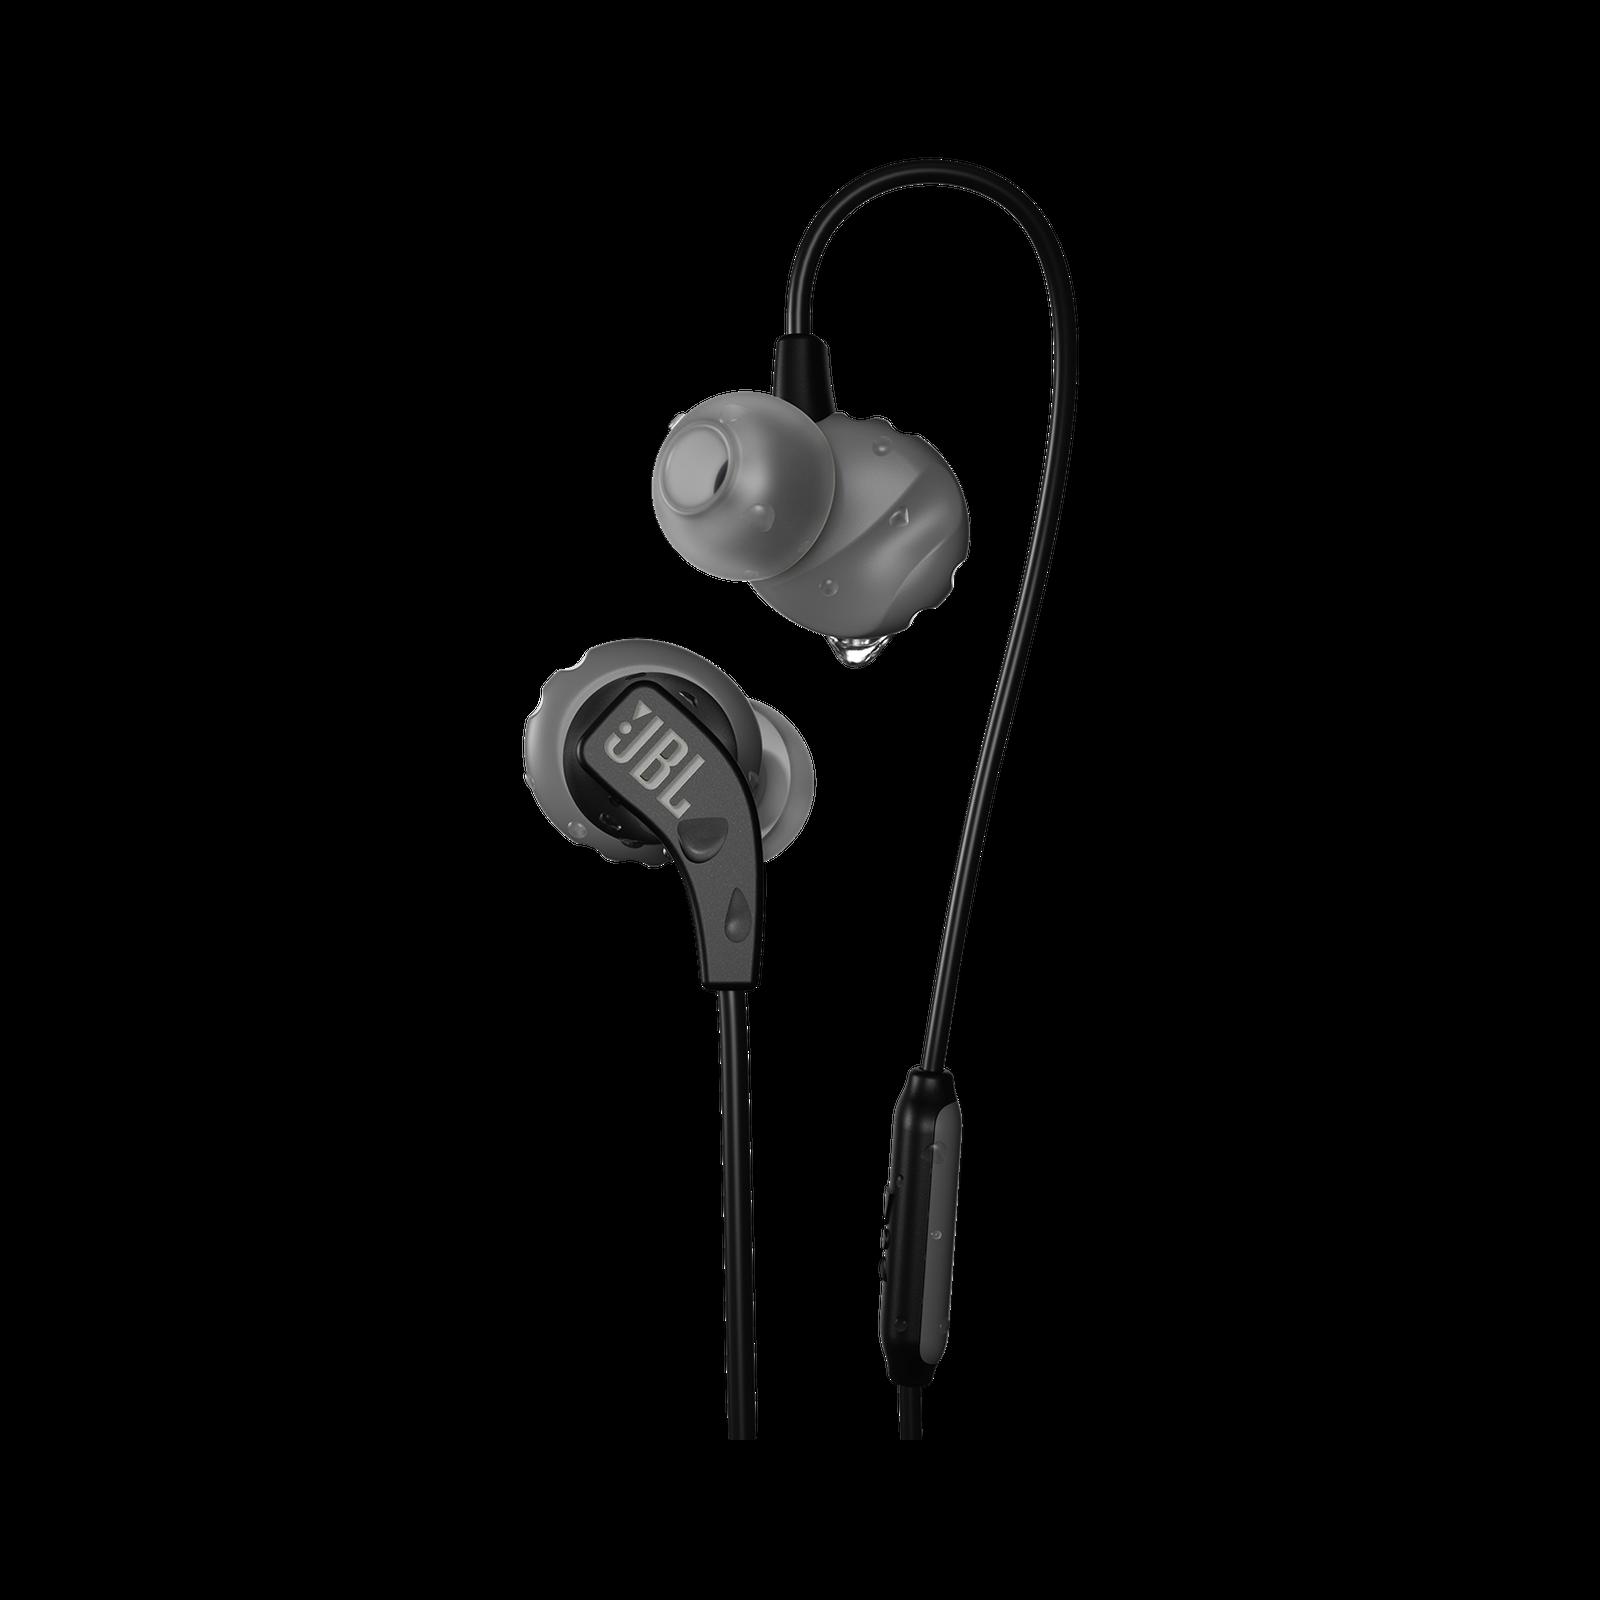 endurance run fliphook headphones with built in